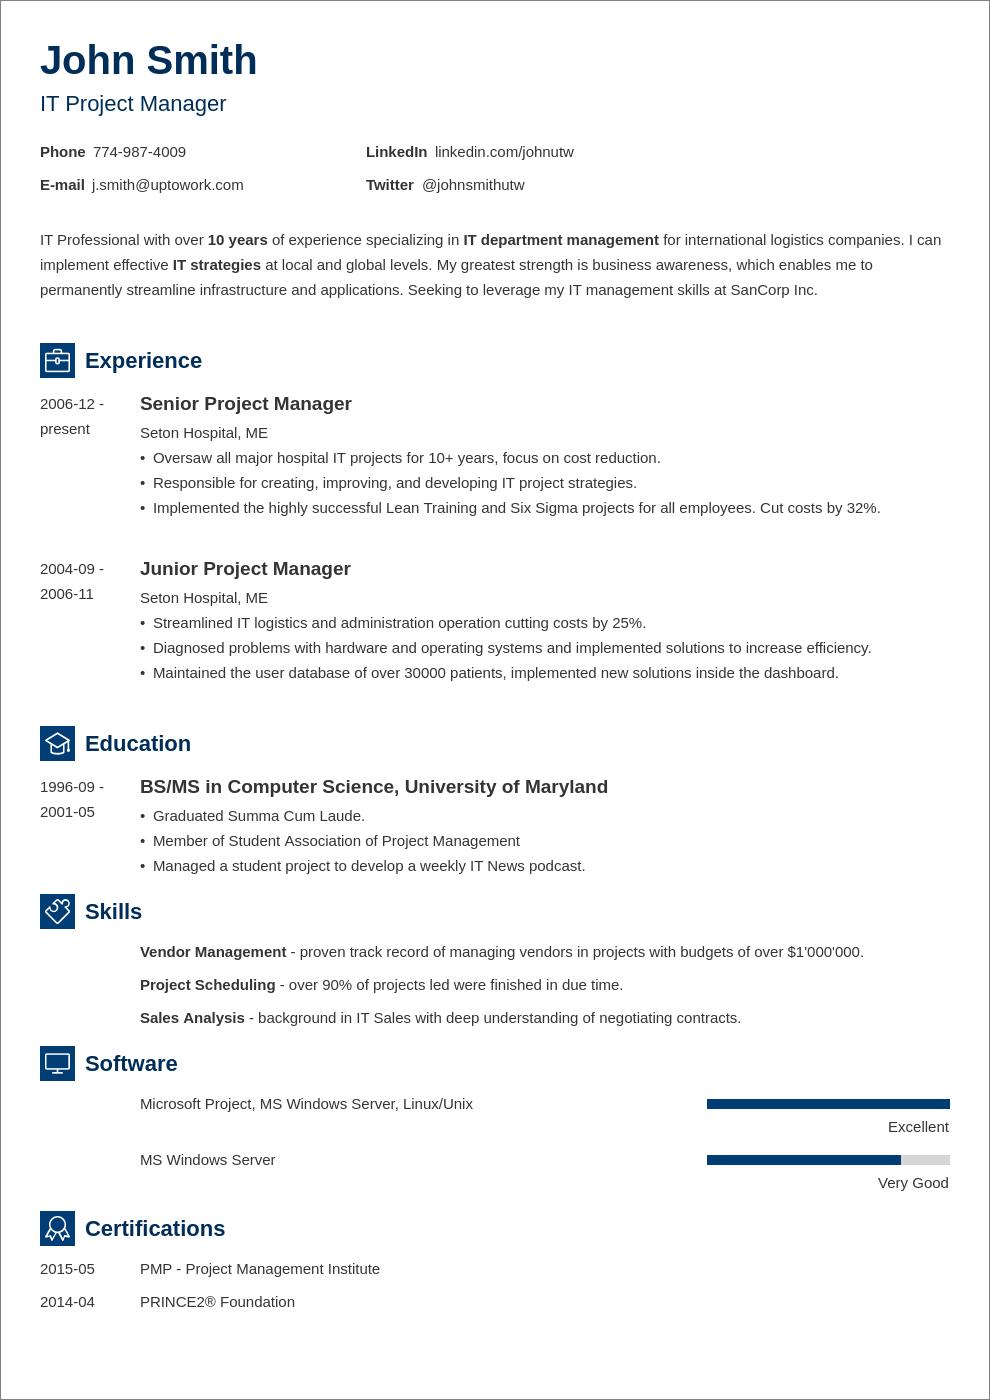 simple CV layout